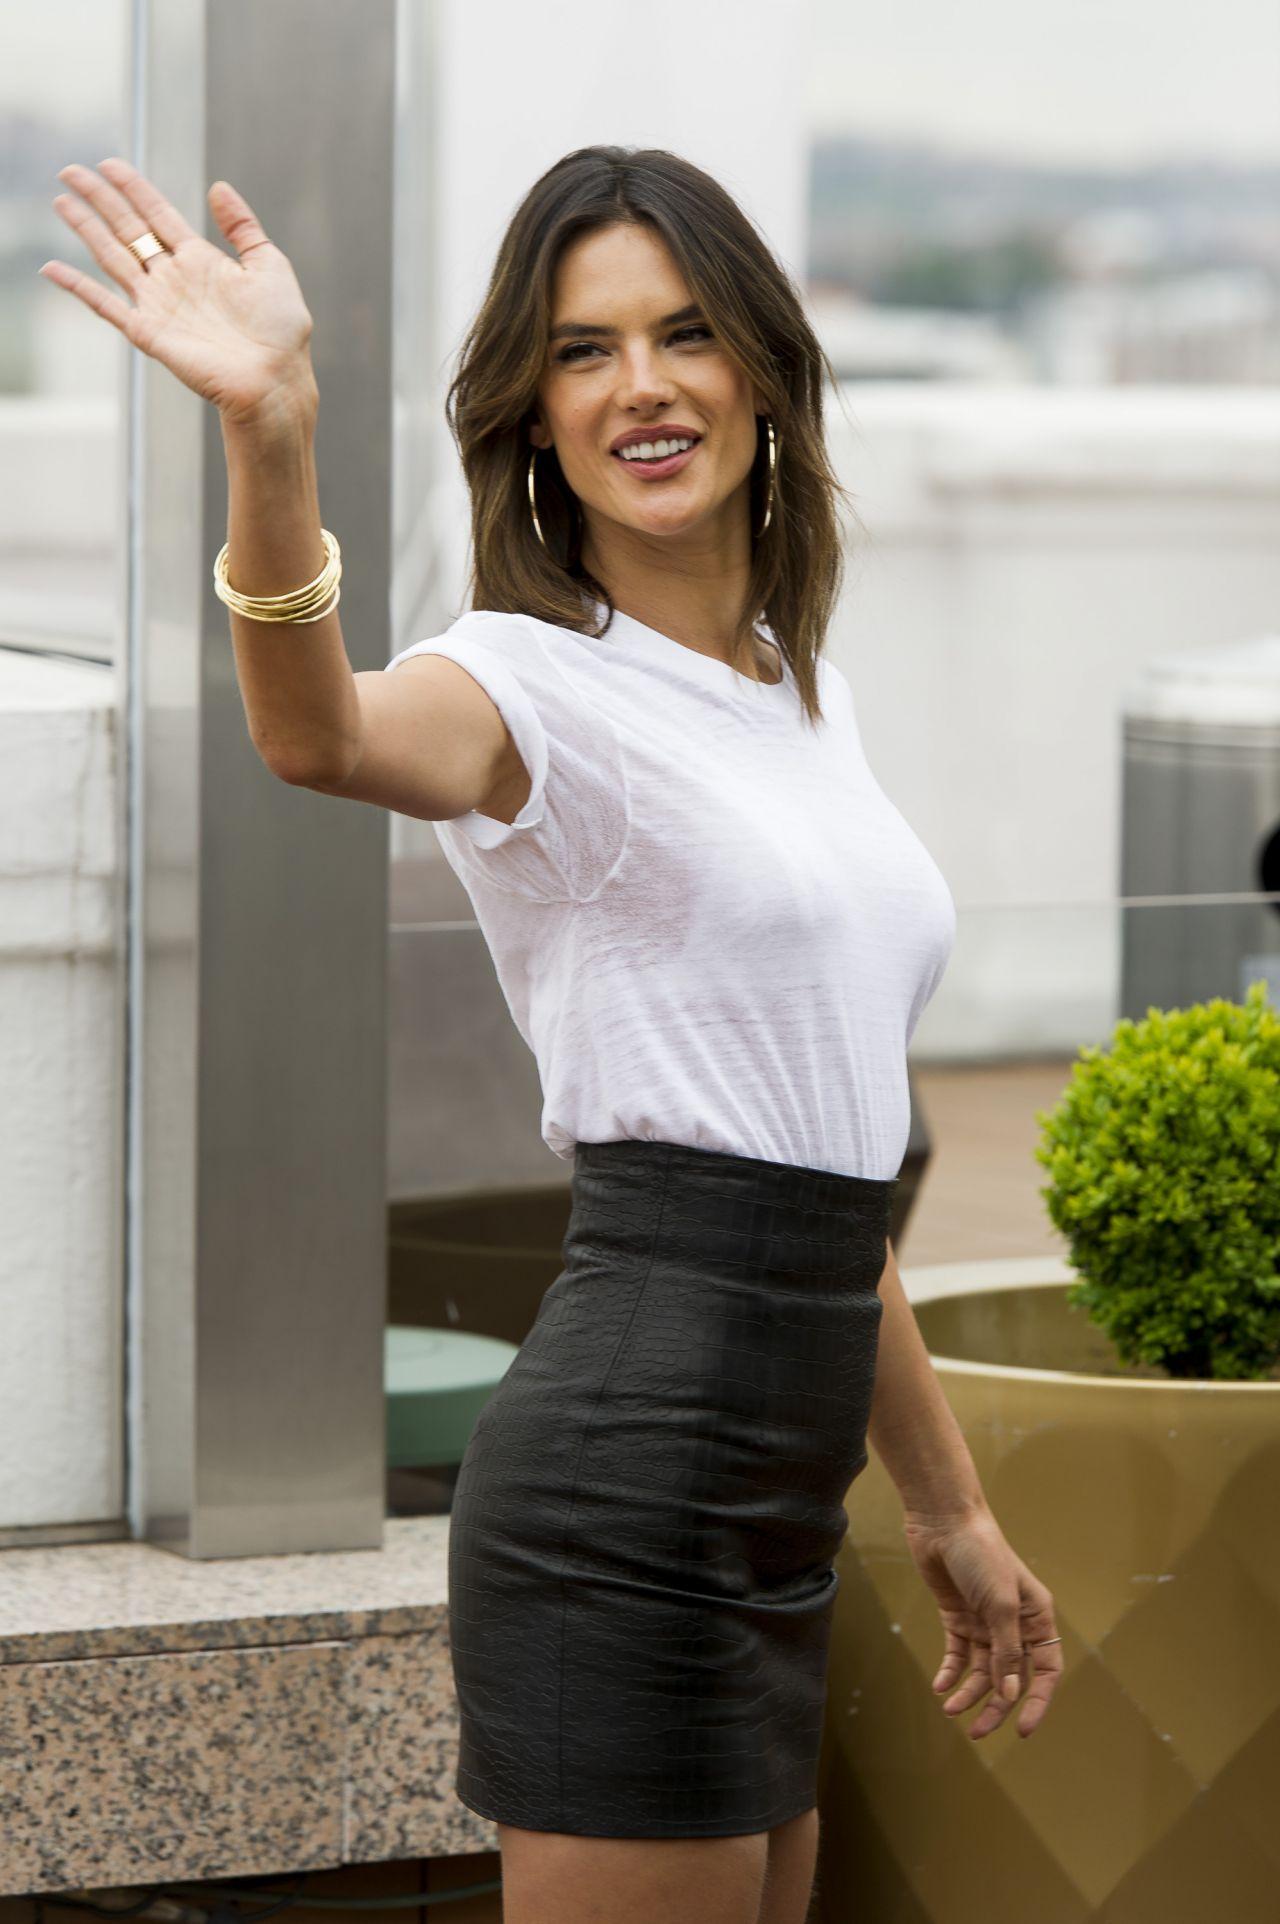 Alessandra Ambrosio Wearing A Miniskirt Presents Xti